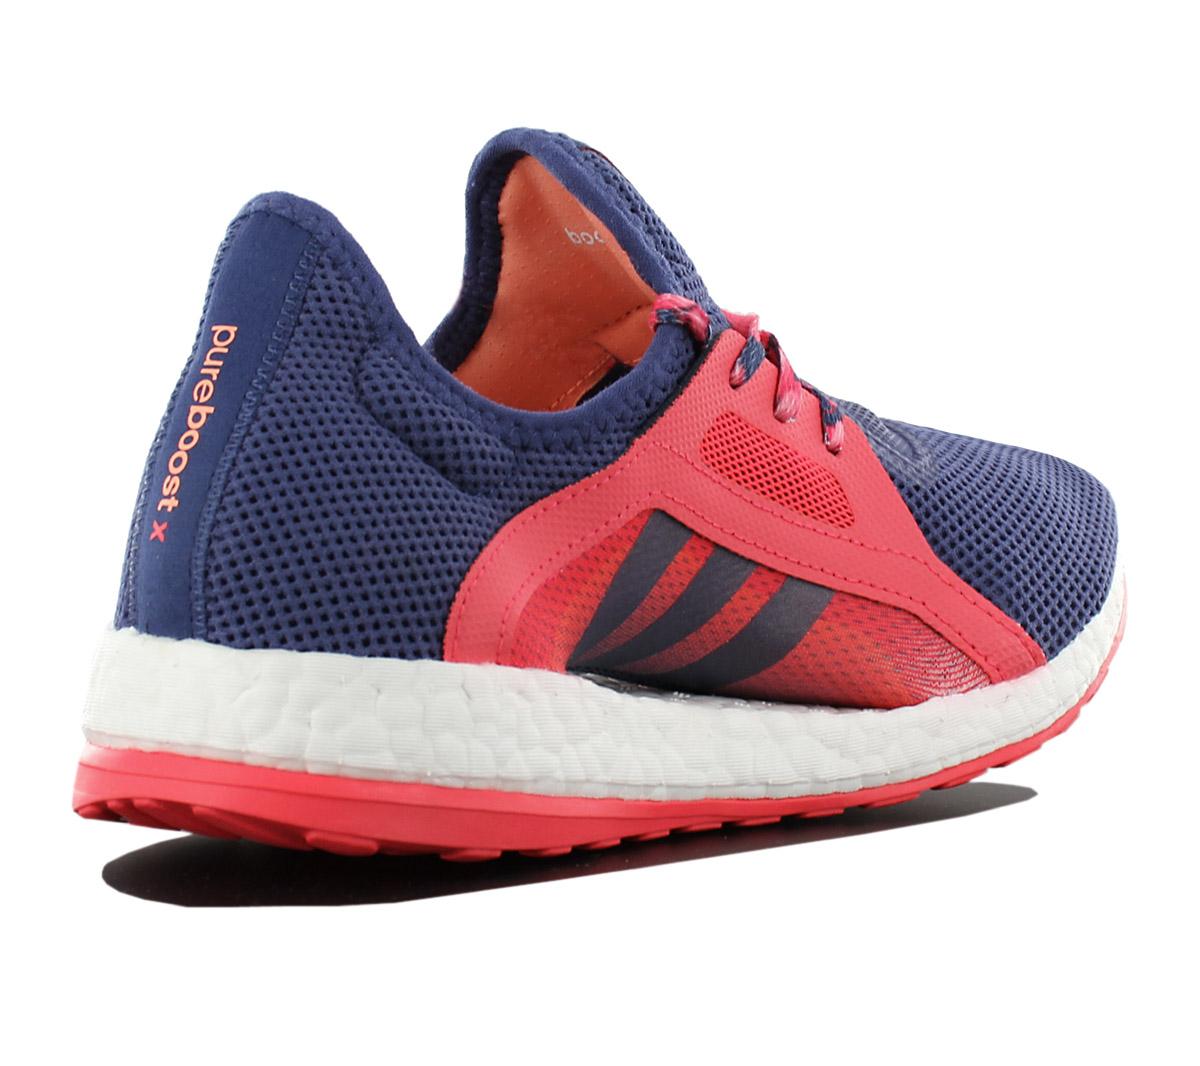 cd3d73eb0 Adidas Pureboost x Ladies Running Shoes Fitness Pure Boost AQ6680 ...